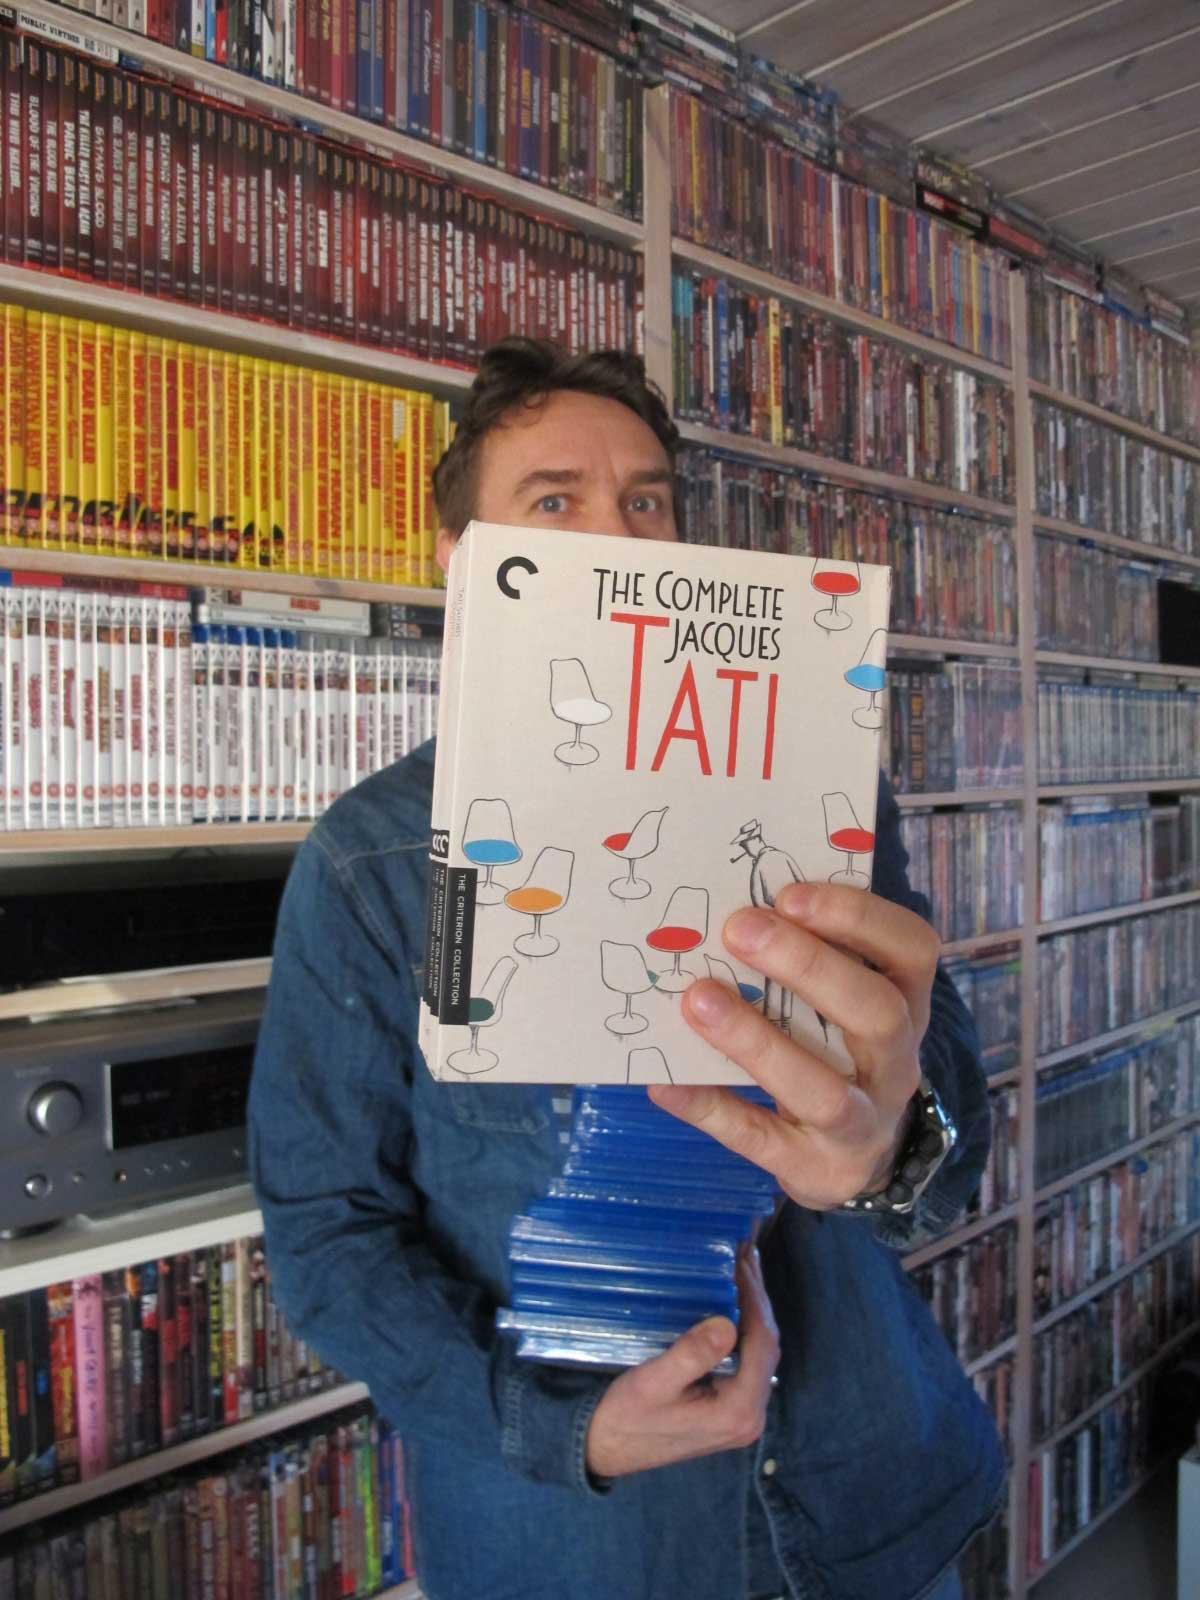 Criterions Jaques Tati-samling på Blu-ray er en av Martin Hauges favoritter i samlingen. Foto: Privat